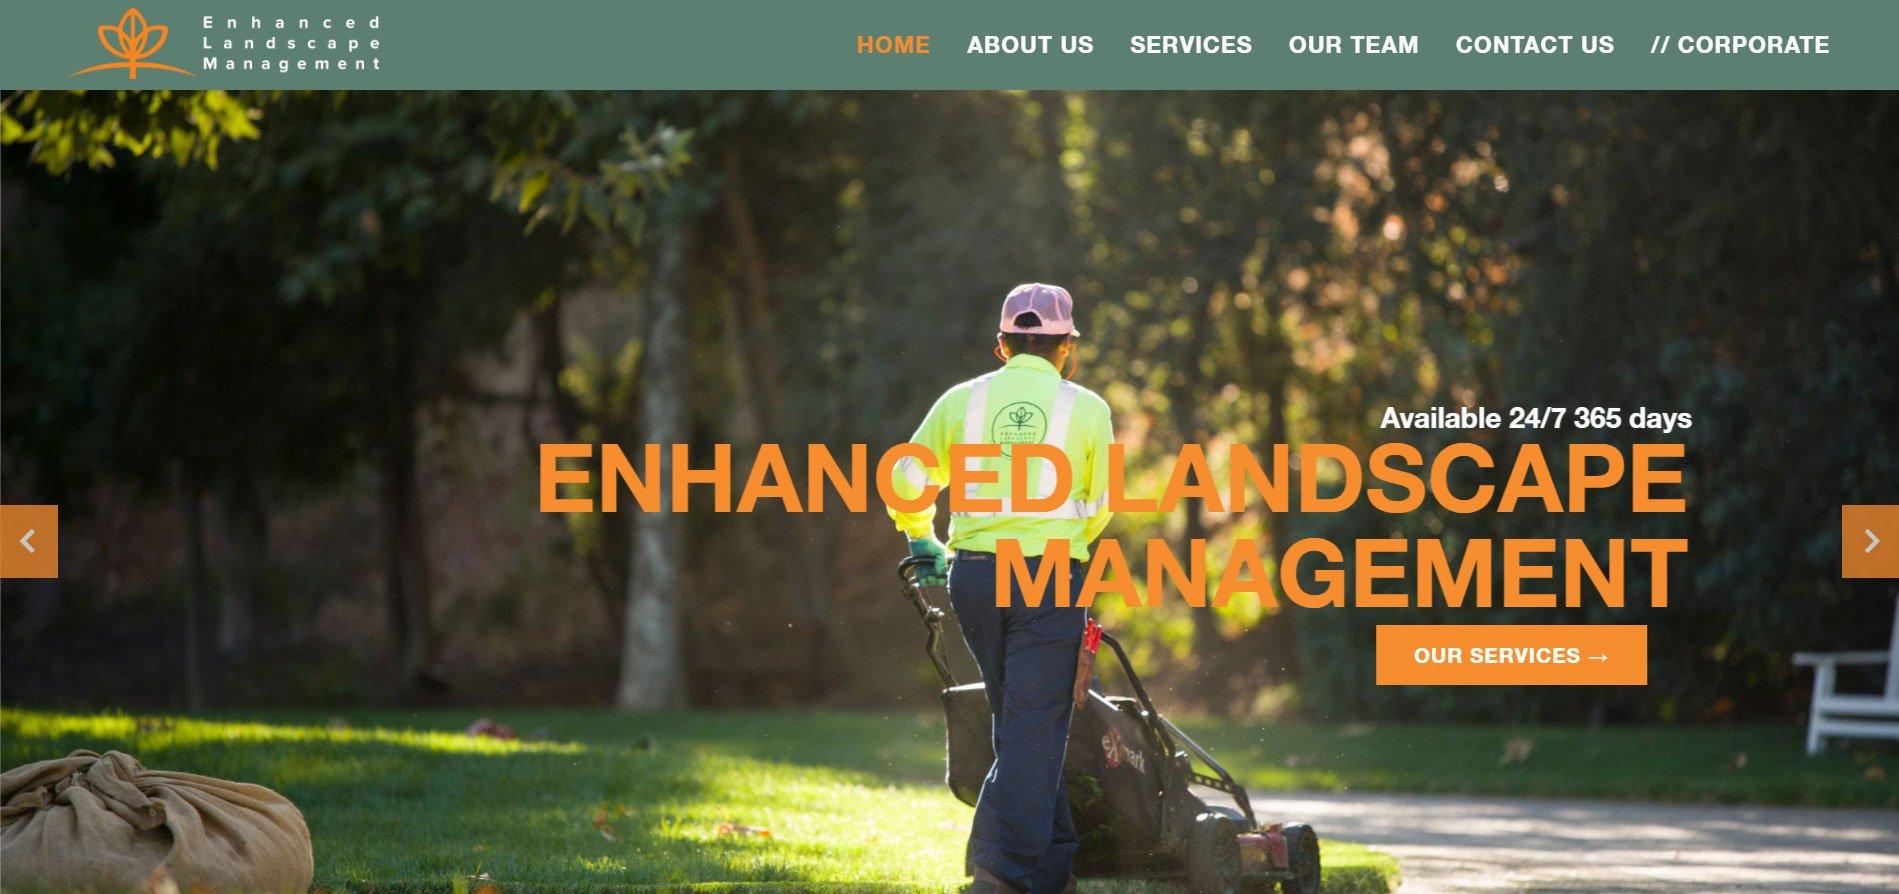 Enhanced Landscape Management Wallpaper